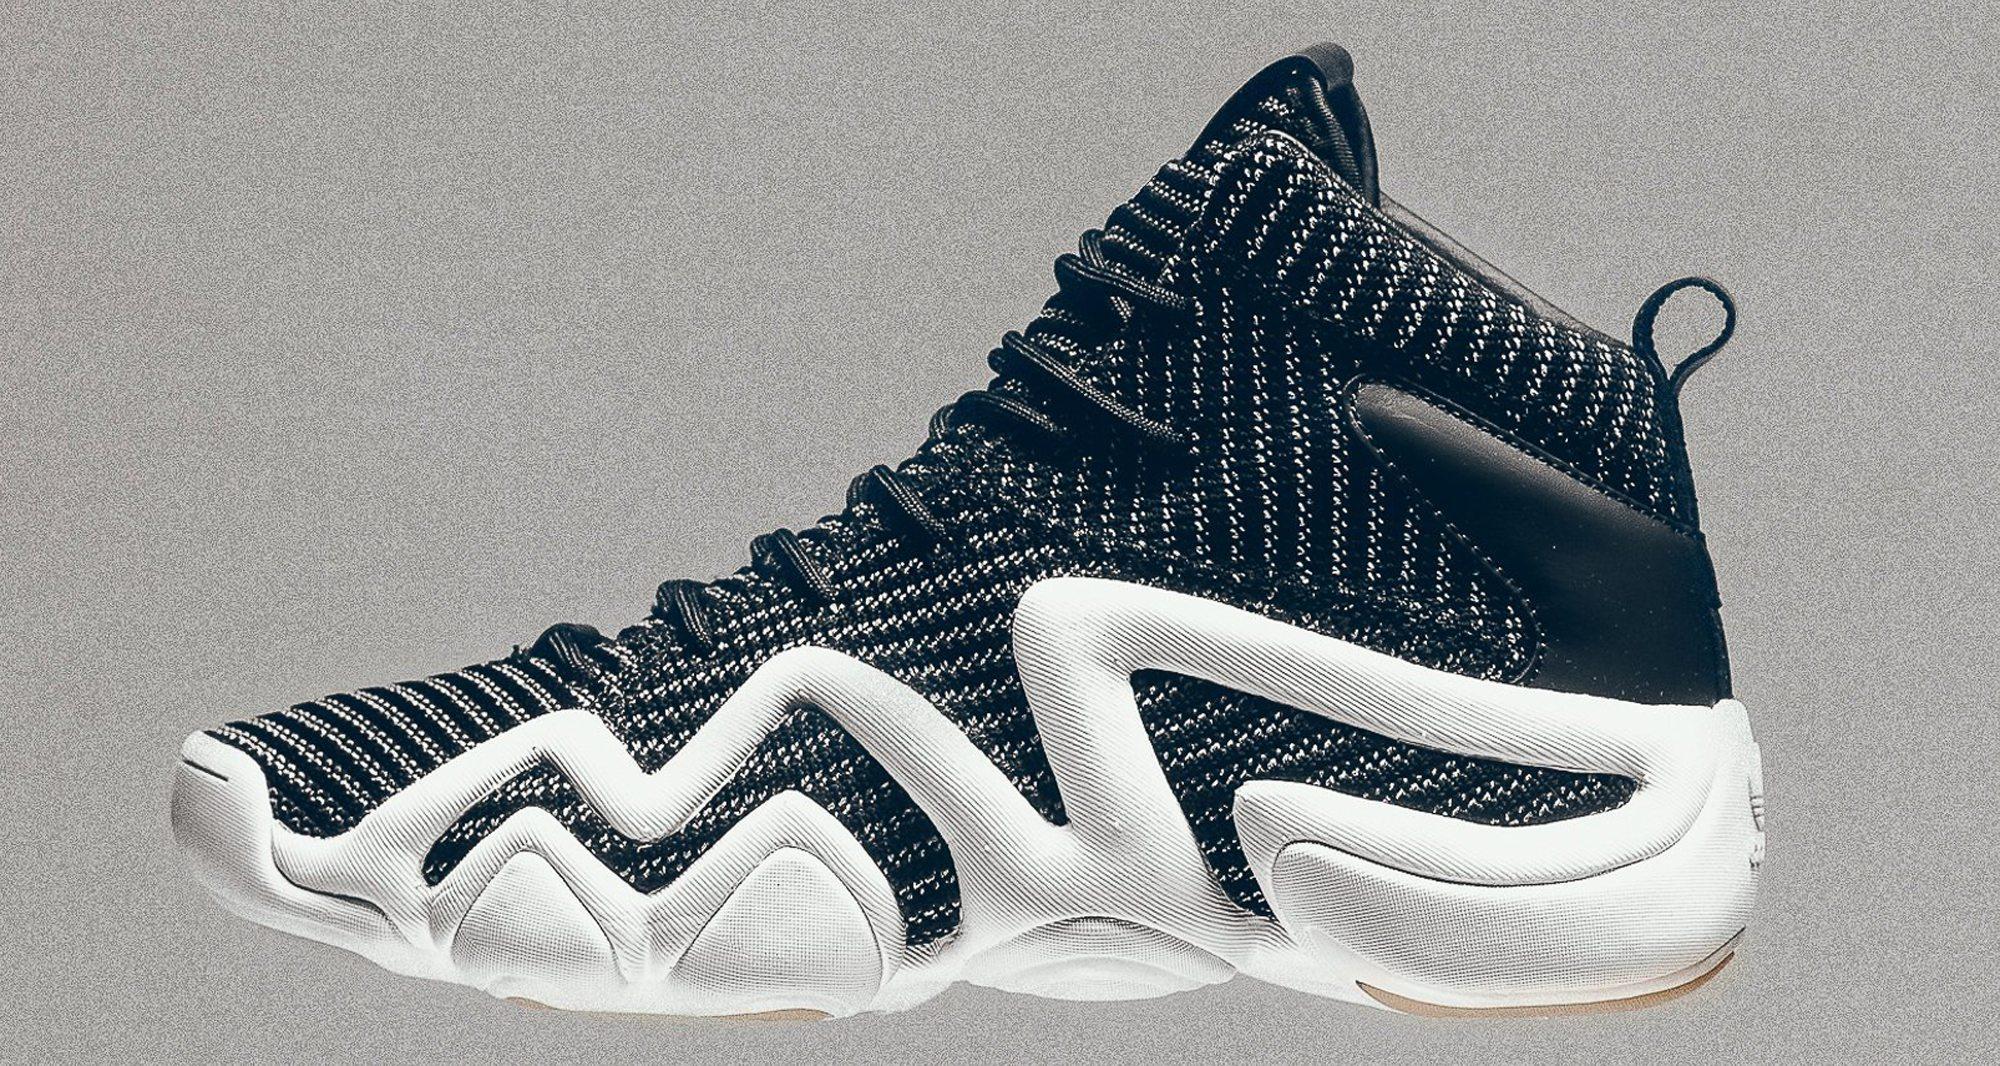 adidas crazy 8 WKHQNWB